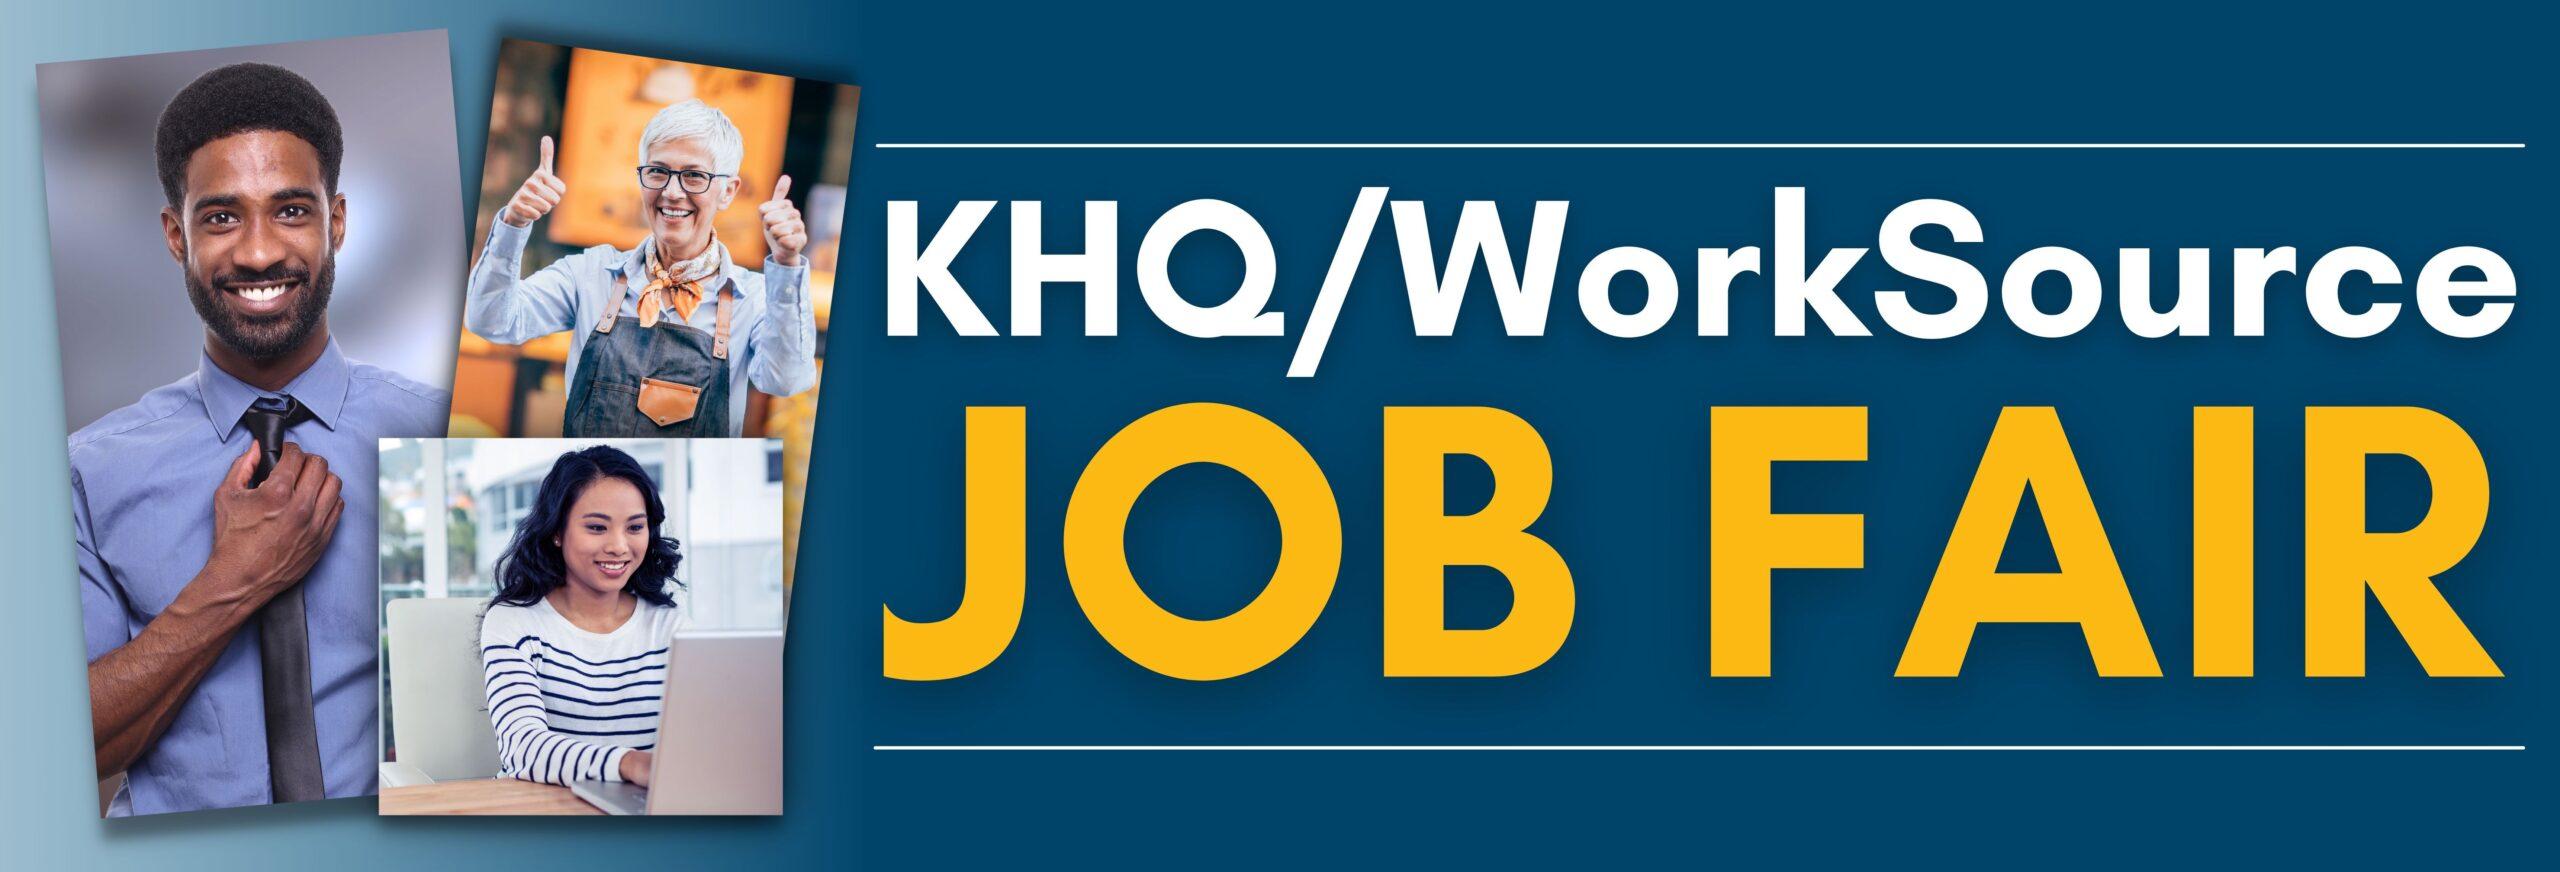 KHQ-WorkSource-Job-Fair-Promo-Image